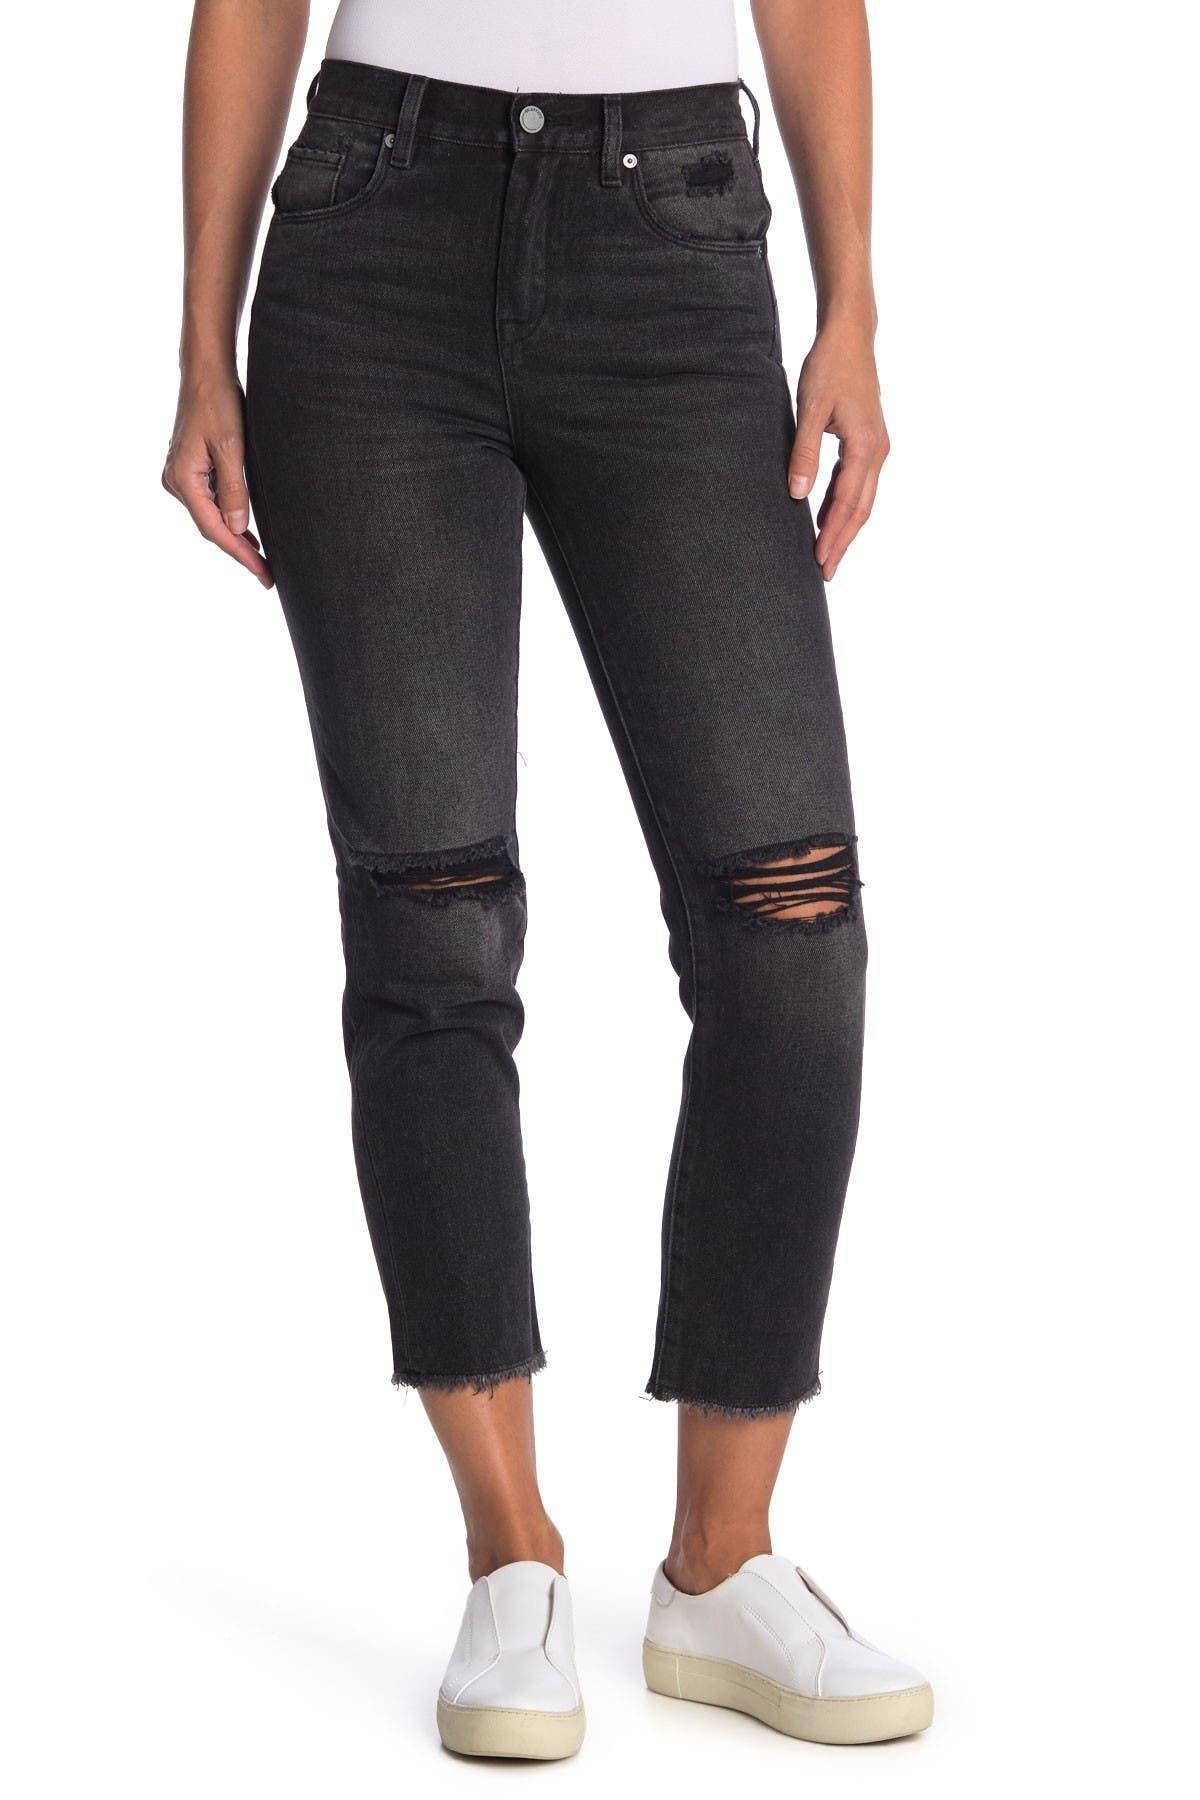 Image of BLANKNYC Denim Madison Distressed Fray Crop Skinny Jeans